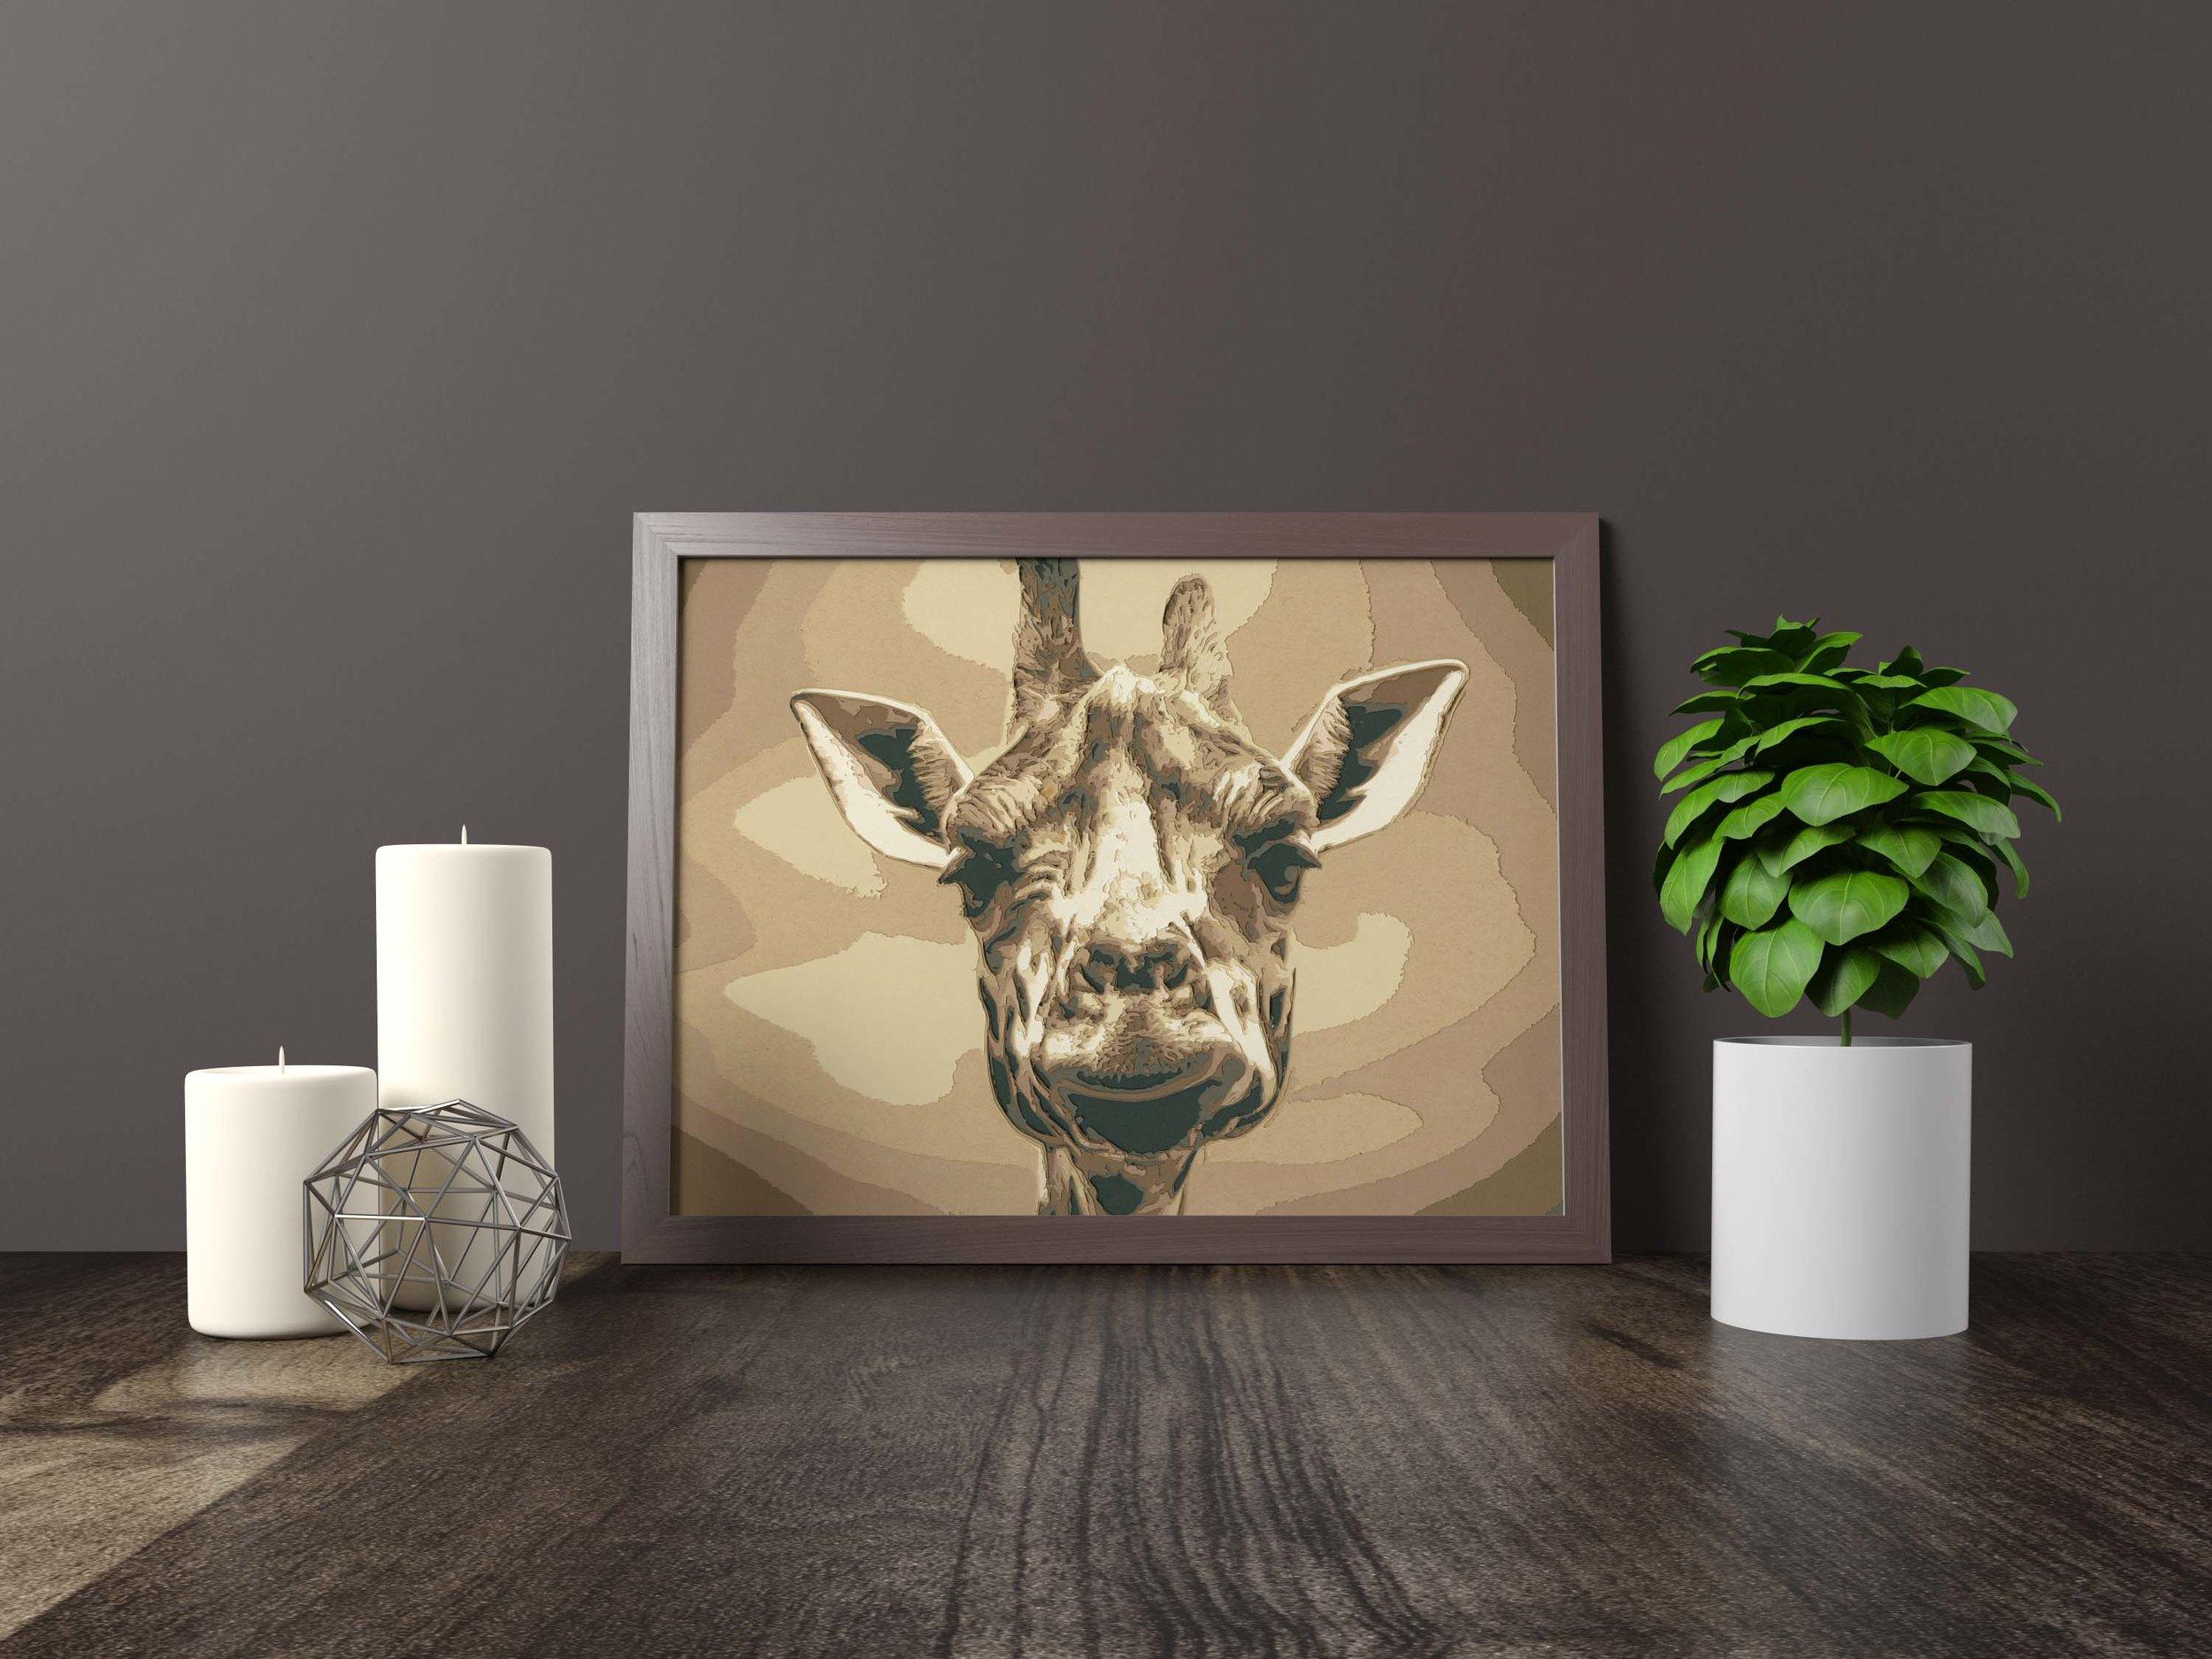 Stand tall giraffe - Original artwork *FOR SALE* 11